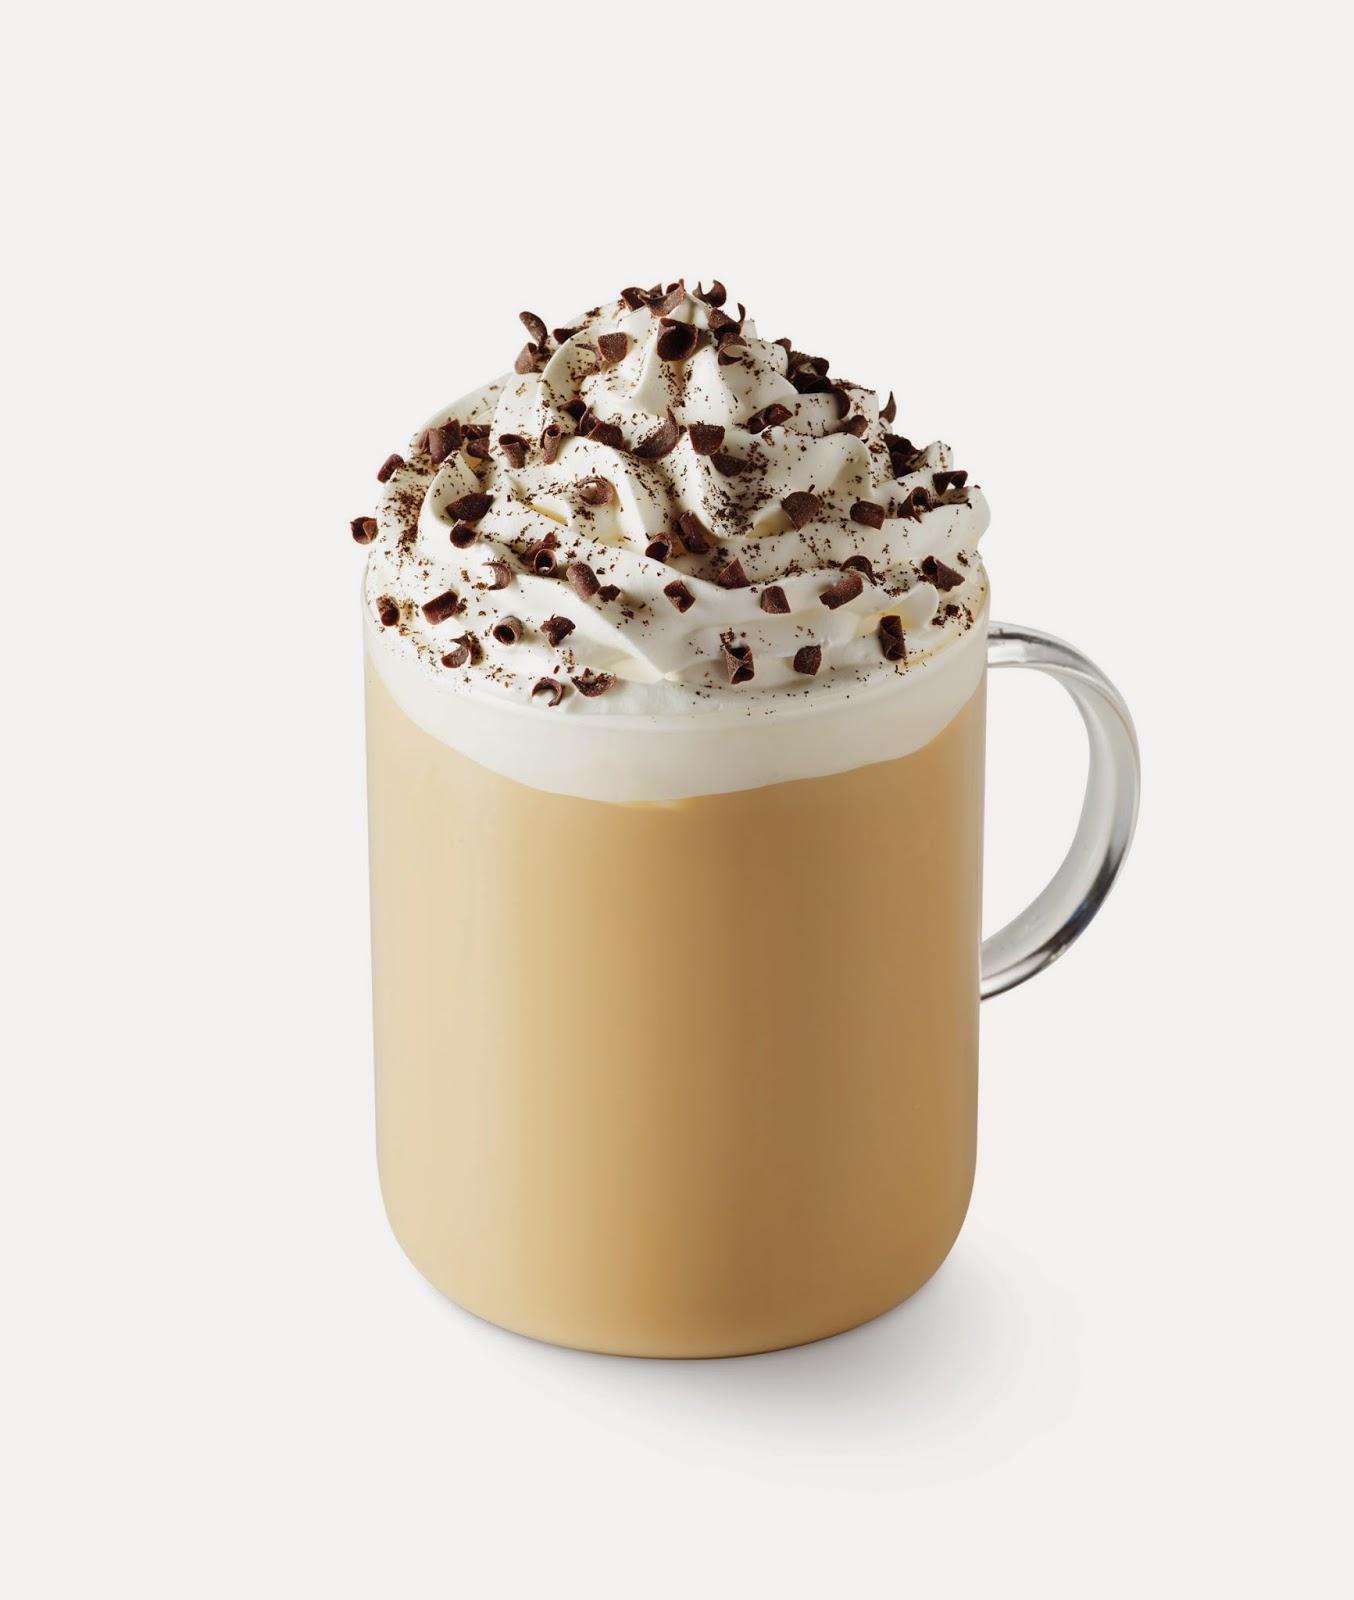 New Latte Drinks From Starbucks Philippines!